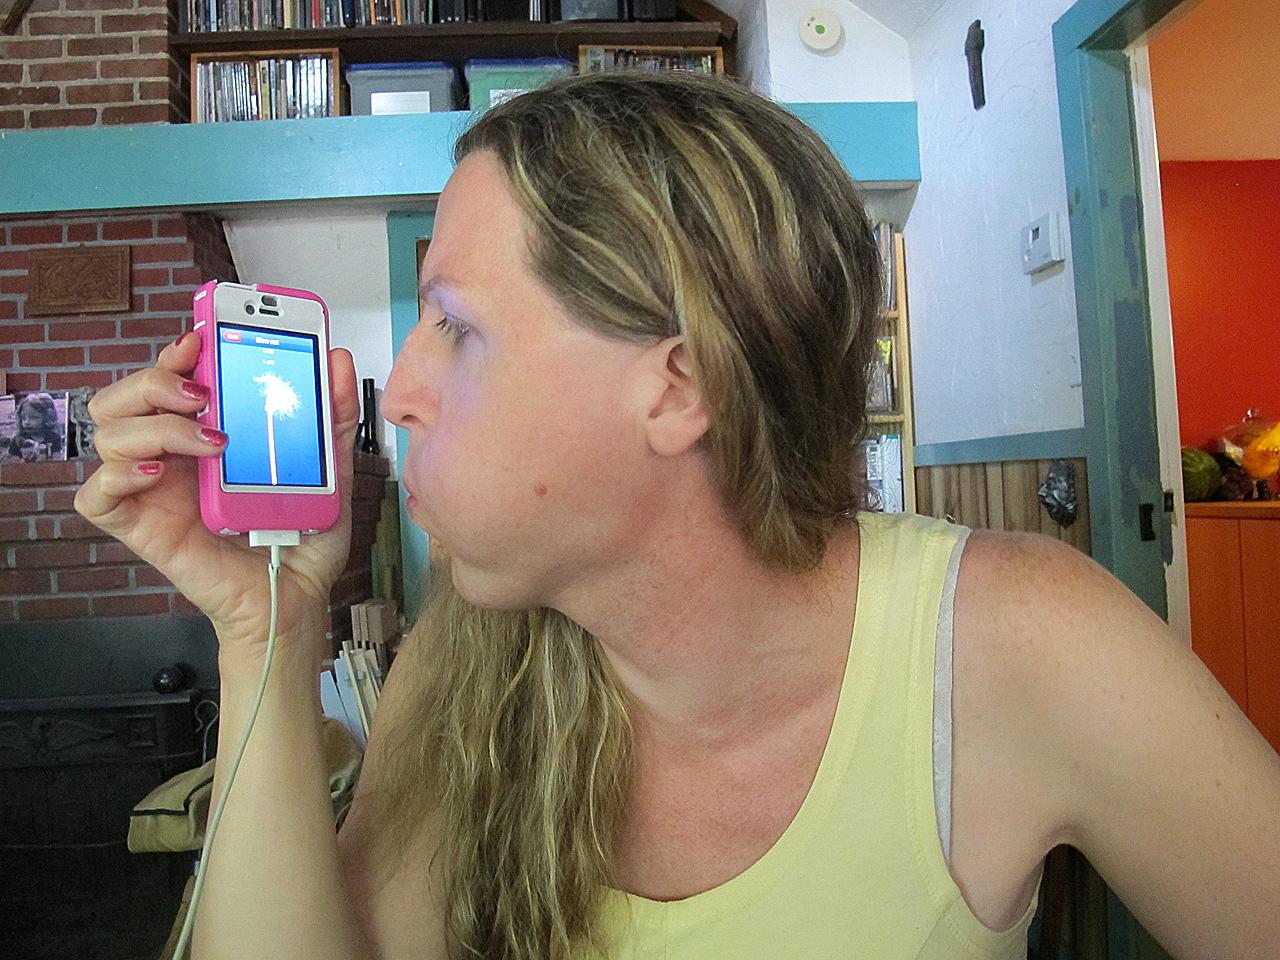 Lorelei Erisis tries out the Eva app in her Ayer home. (Martha Bebinger/WBUR)